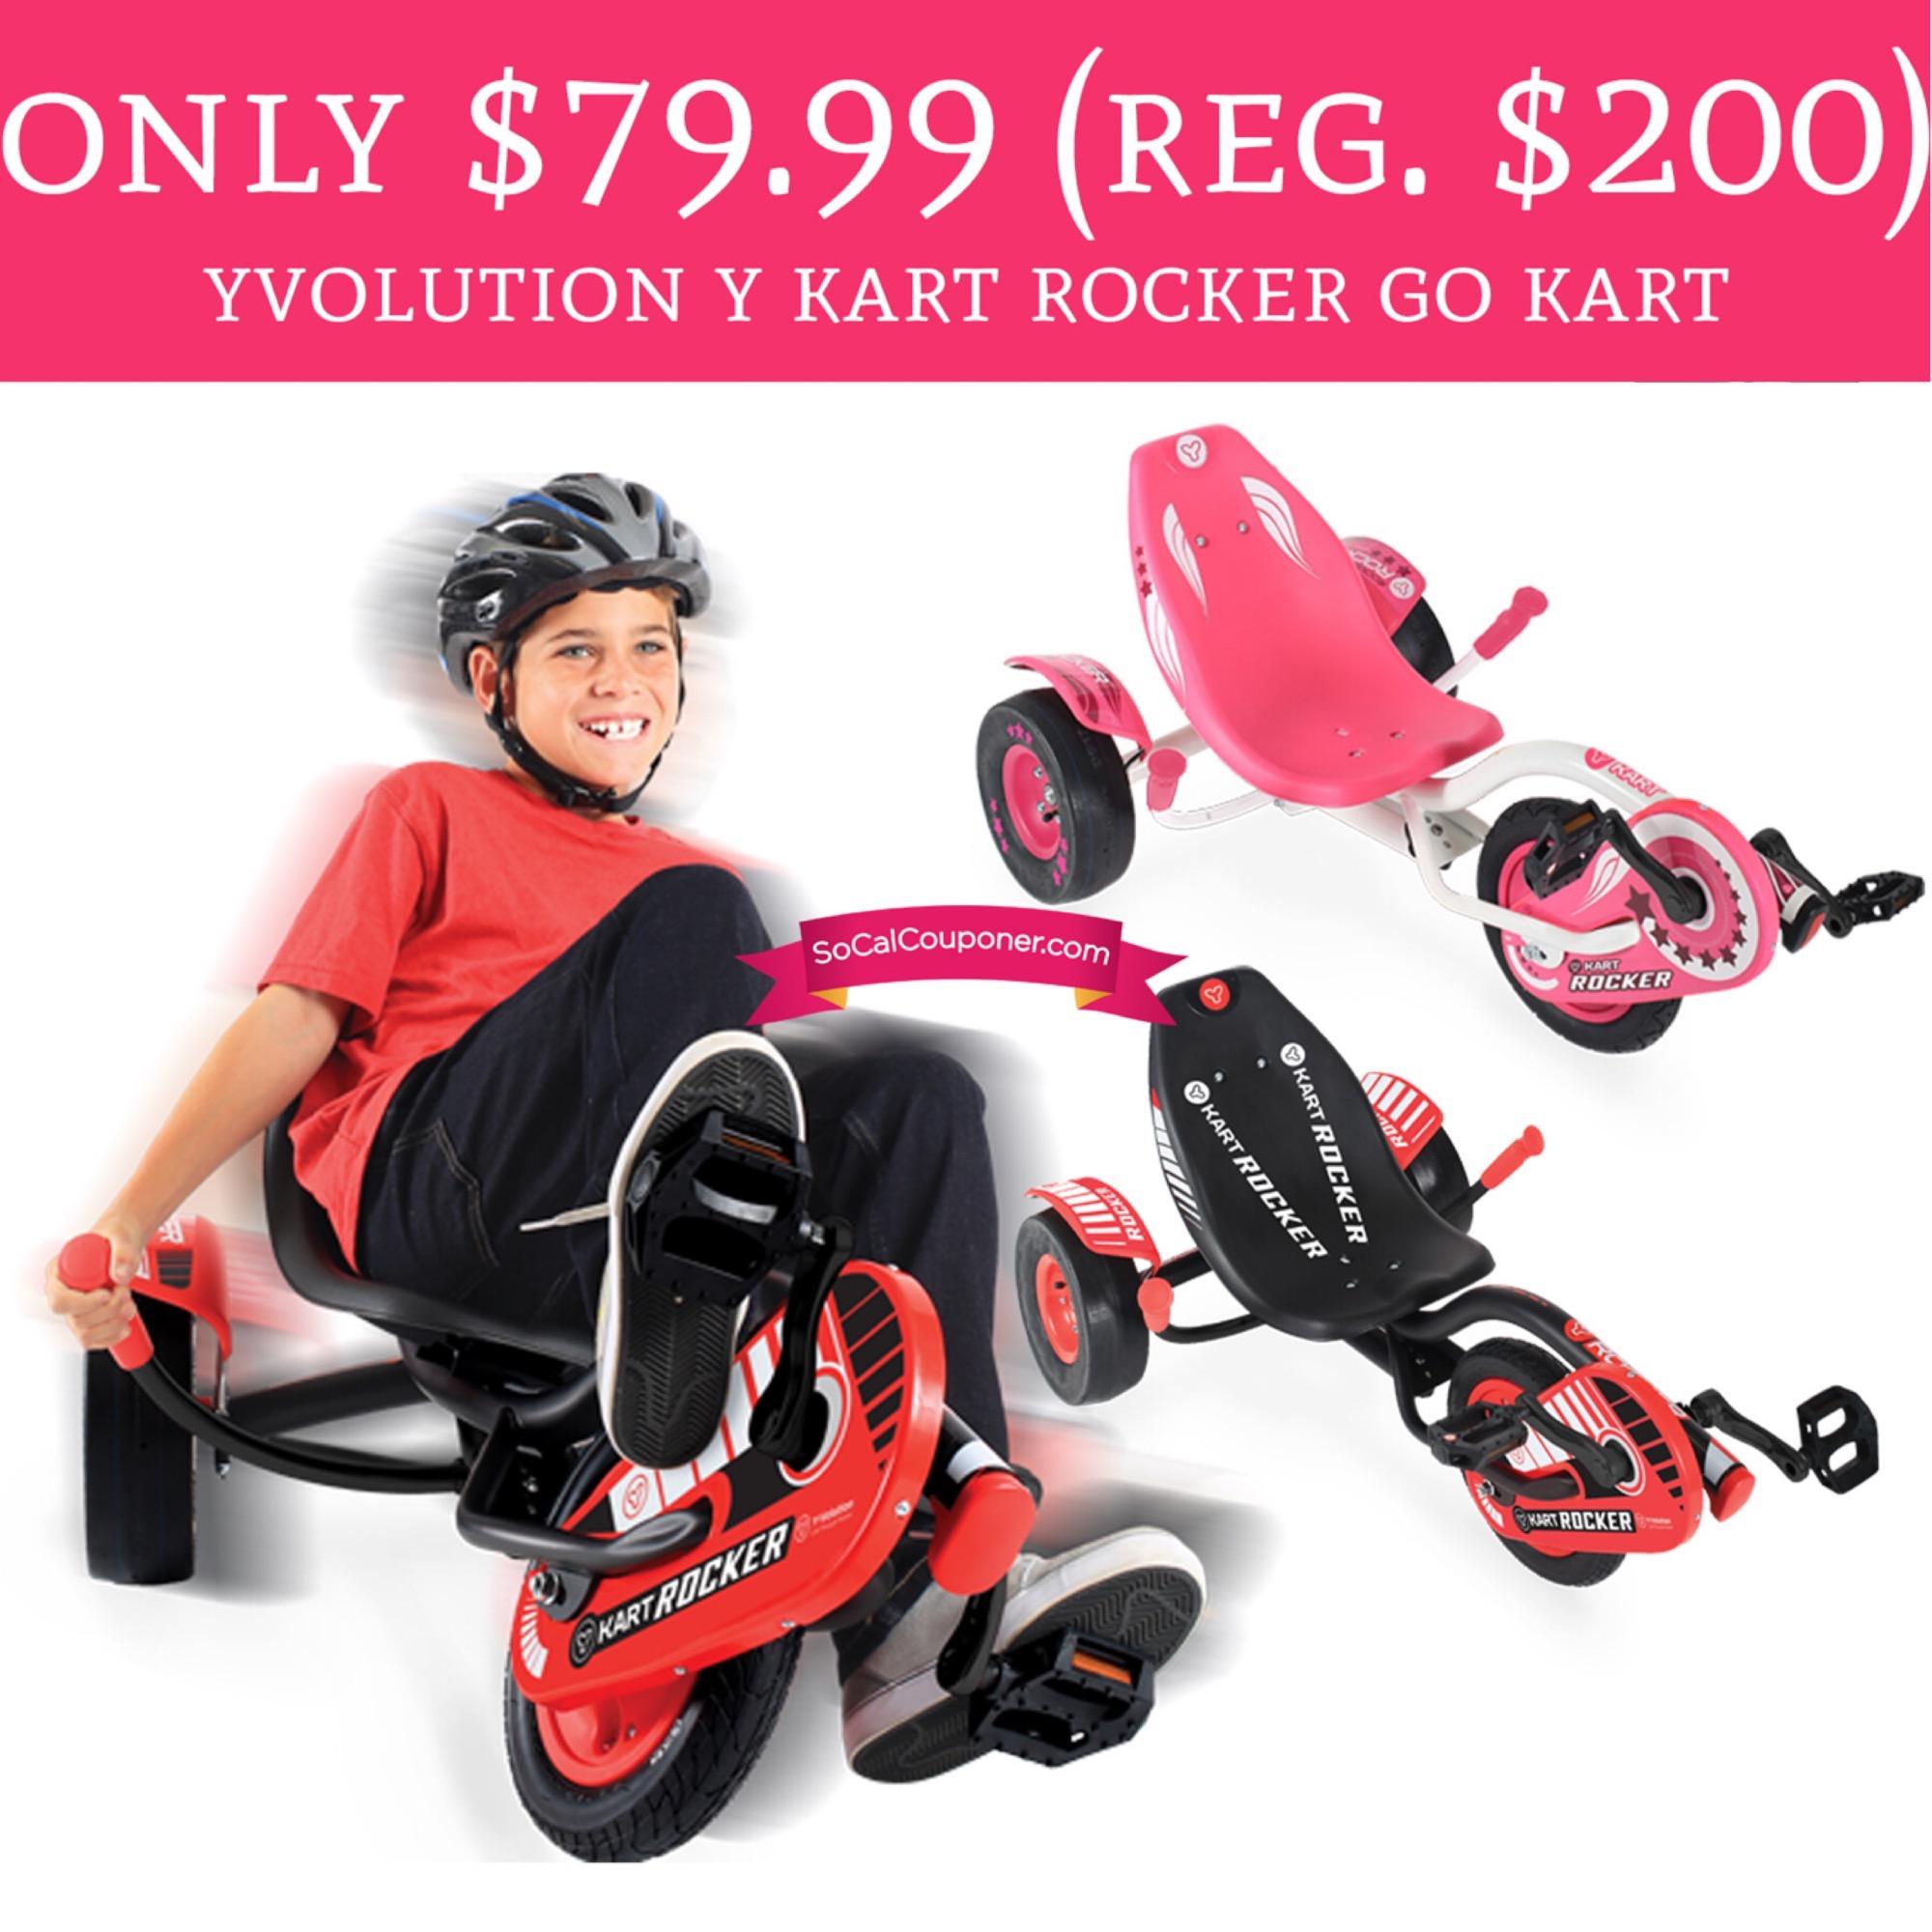 Only 7999 Reg 200 Yvolution Y Kart Rocker Go Kart Free Shipping Deal Hunting Babe